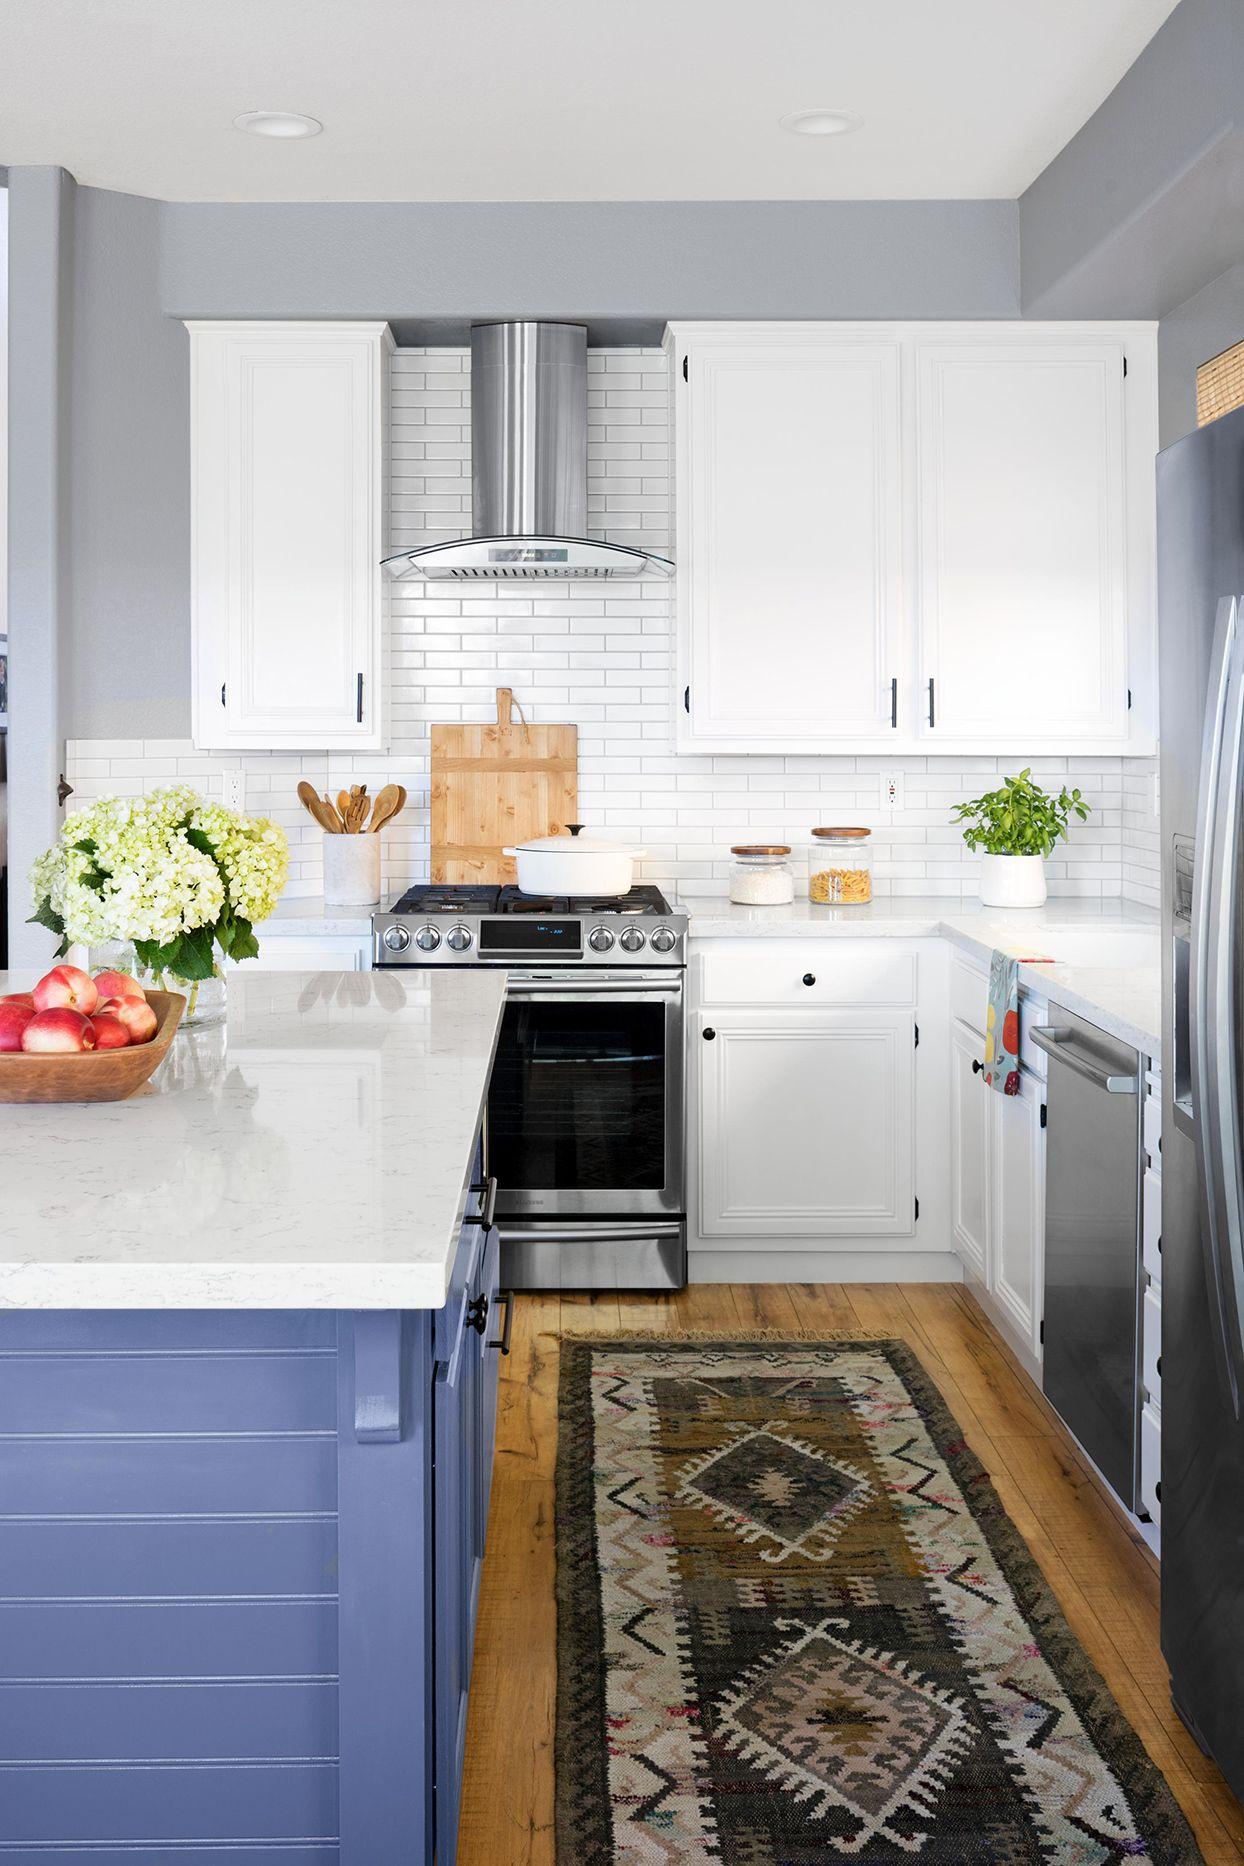 Fundamental Kitchen Design Guidelines To Know Before You Remodel Elegant Kitchen Design Kitchen Layout Kitchen Island With Sink And Dishwasher